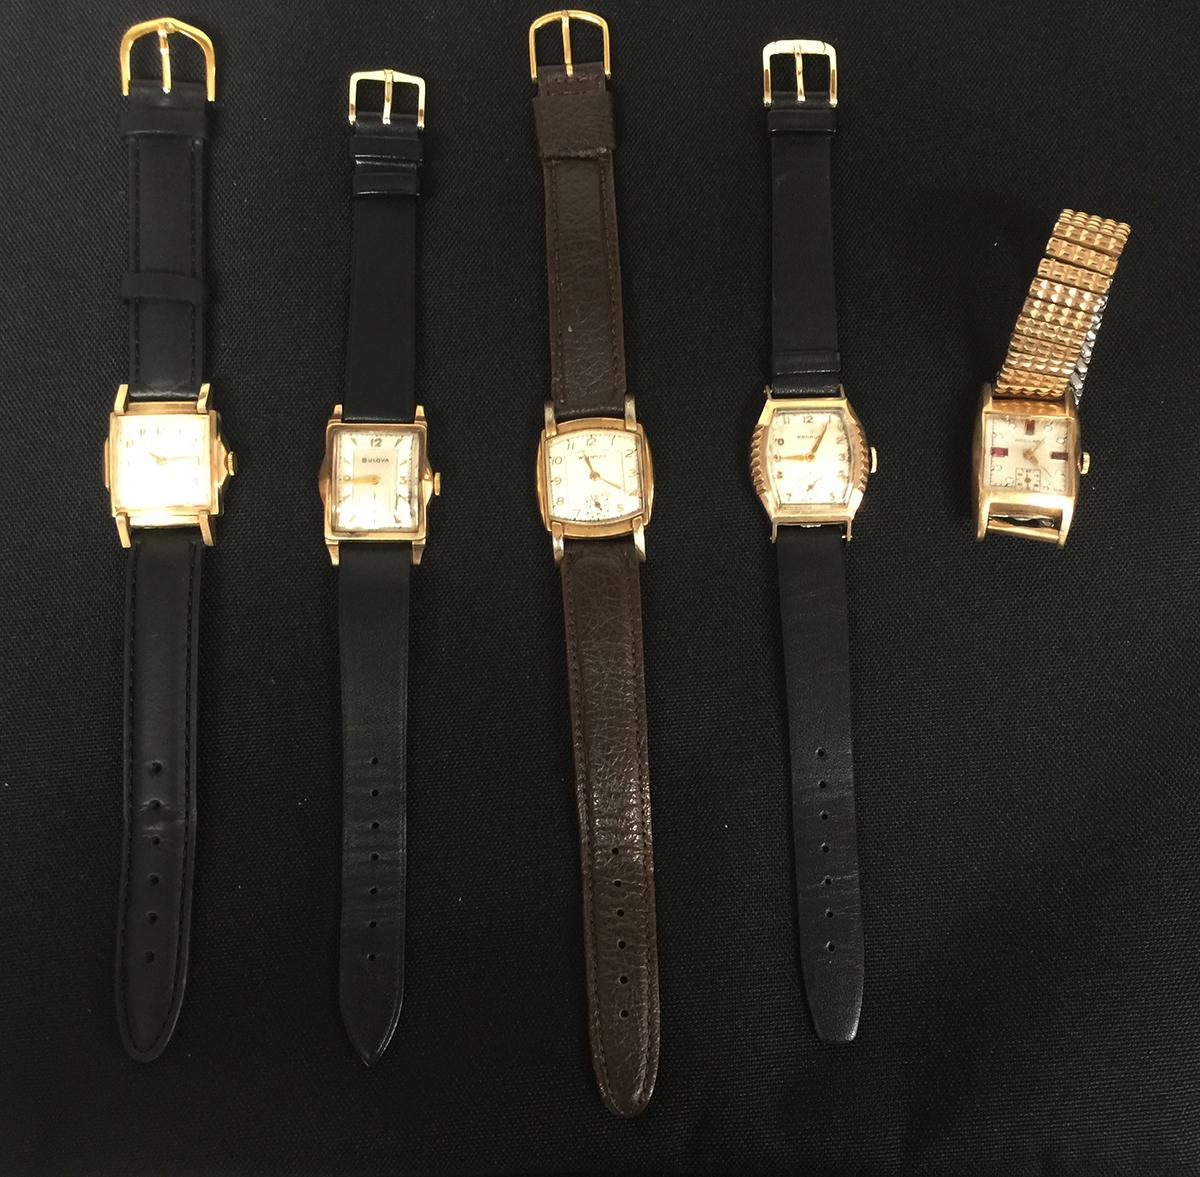 Antique Watches 1